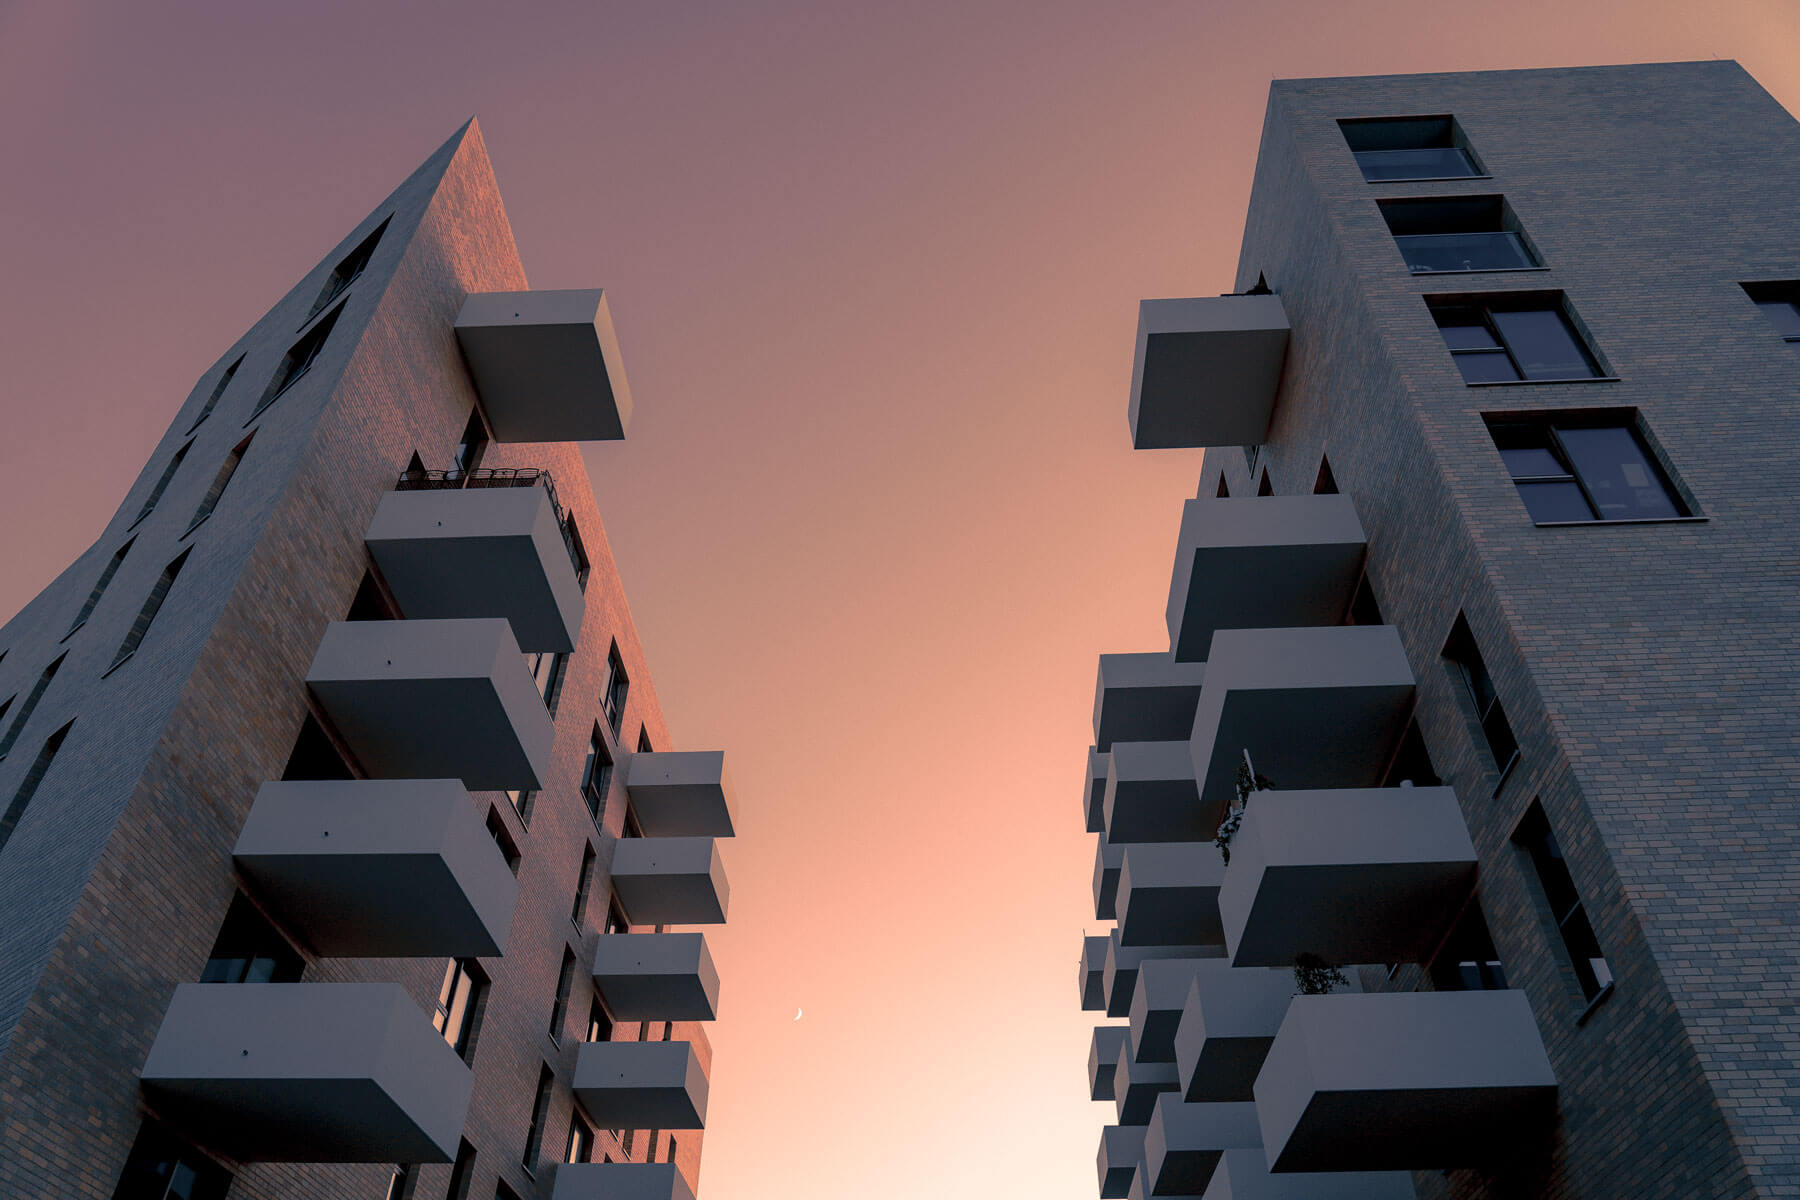 architektur-sonnenuntergang-rosa-mond